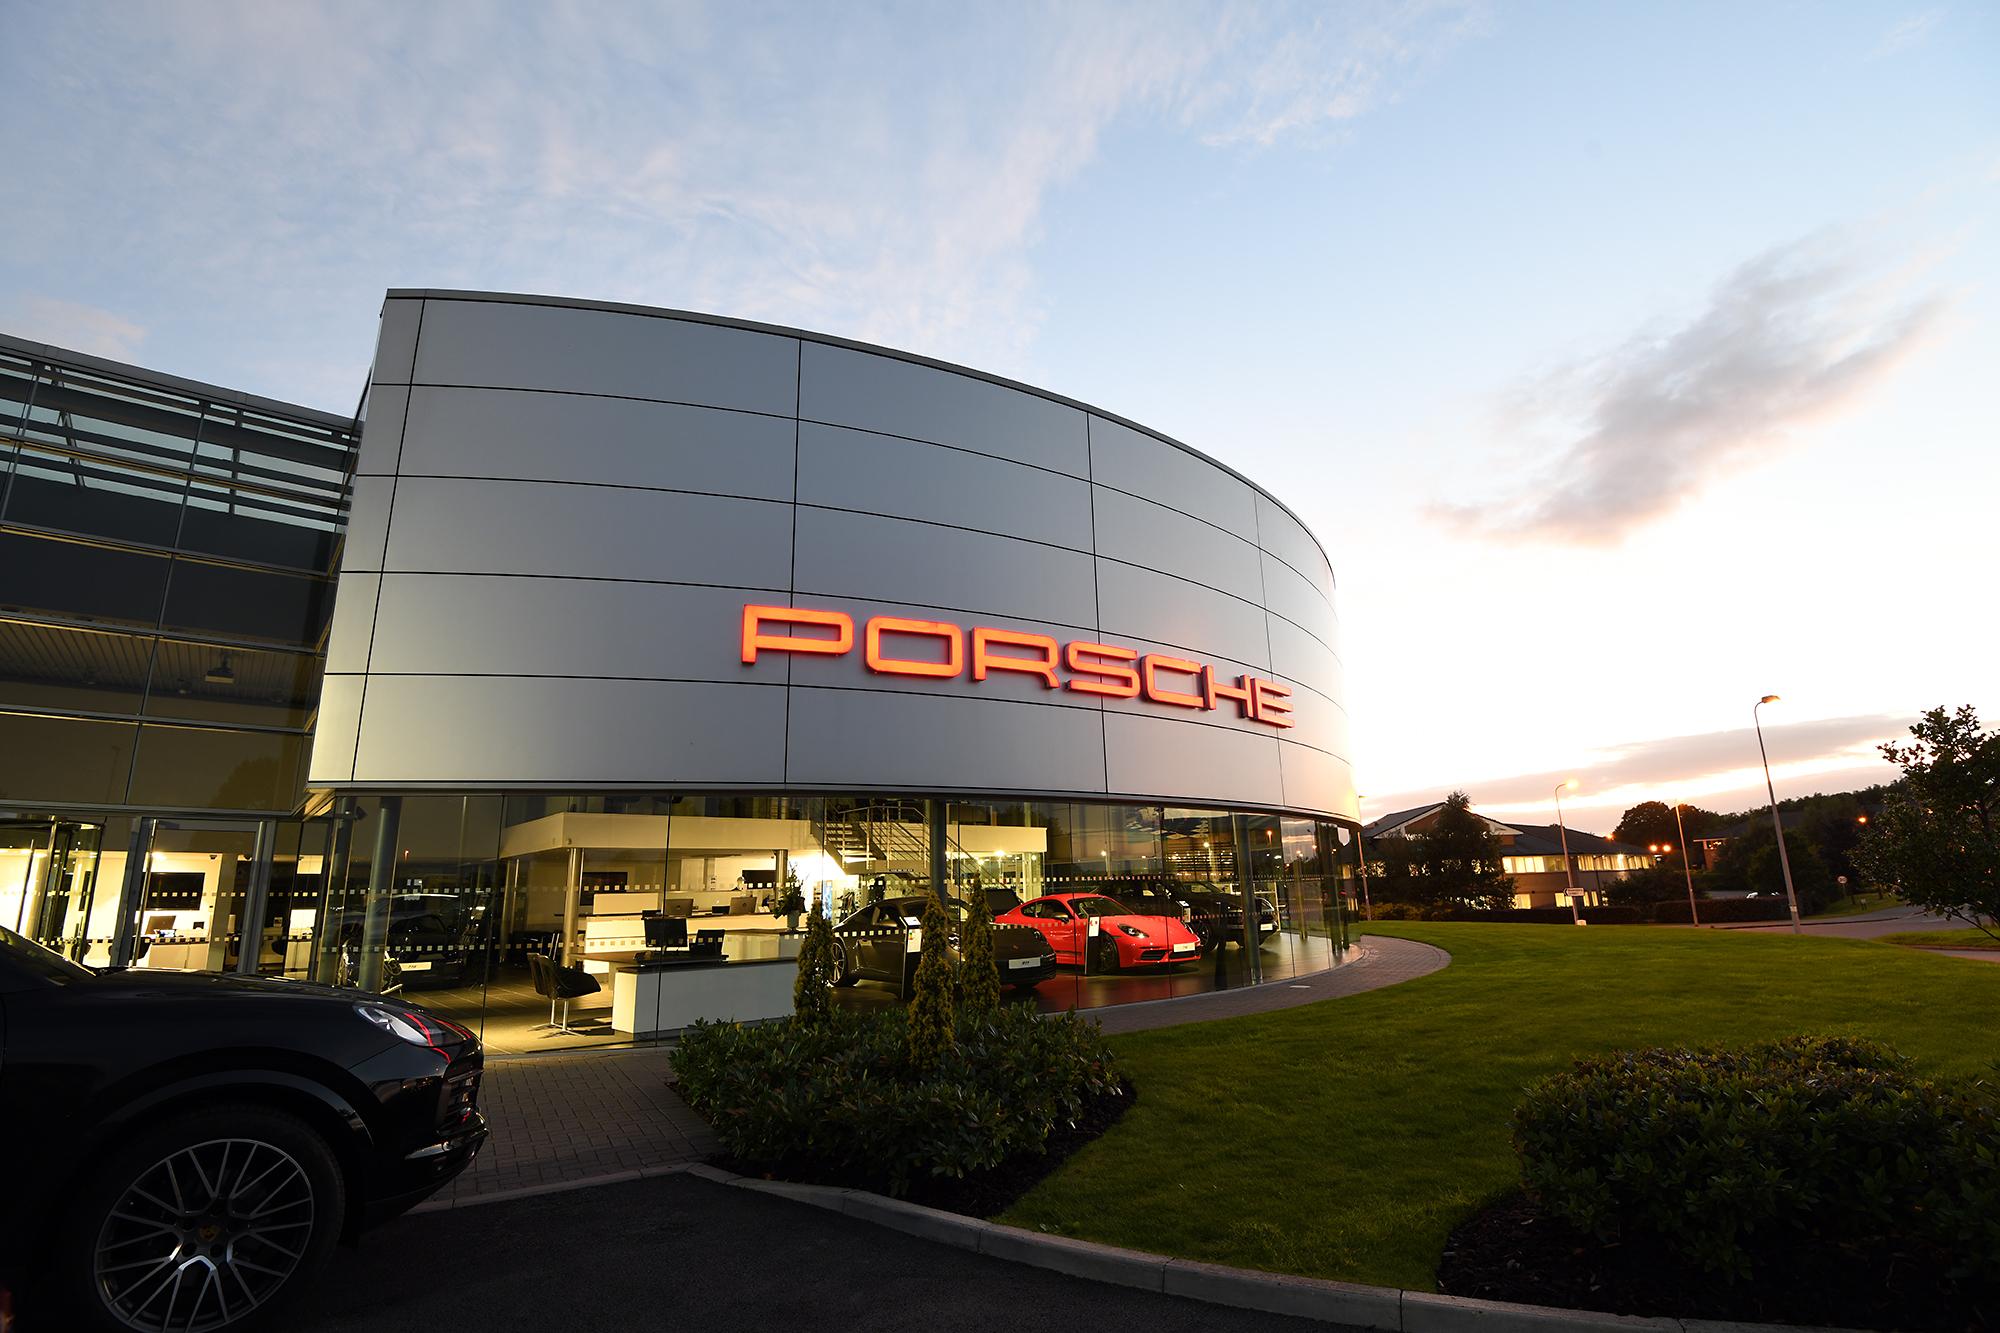 Traditional photographic image - Porsche 6